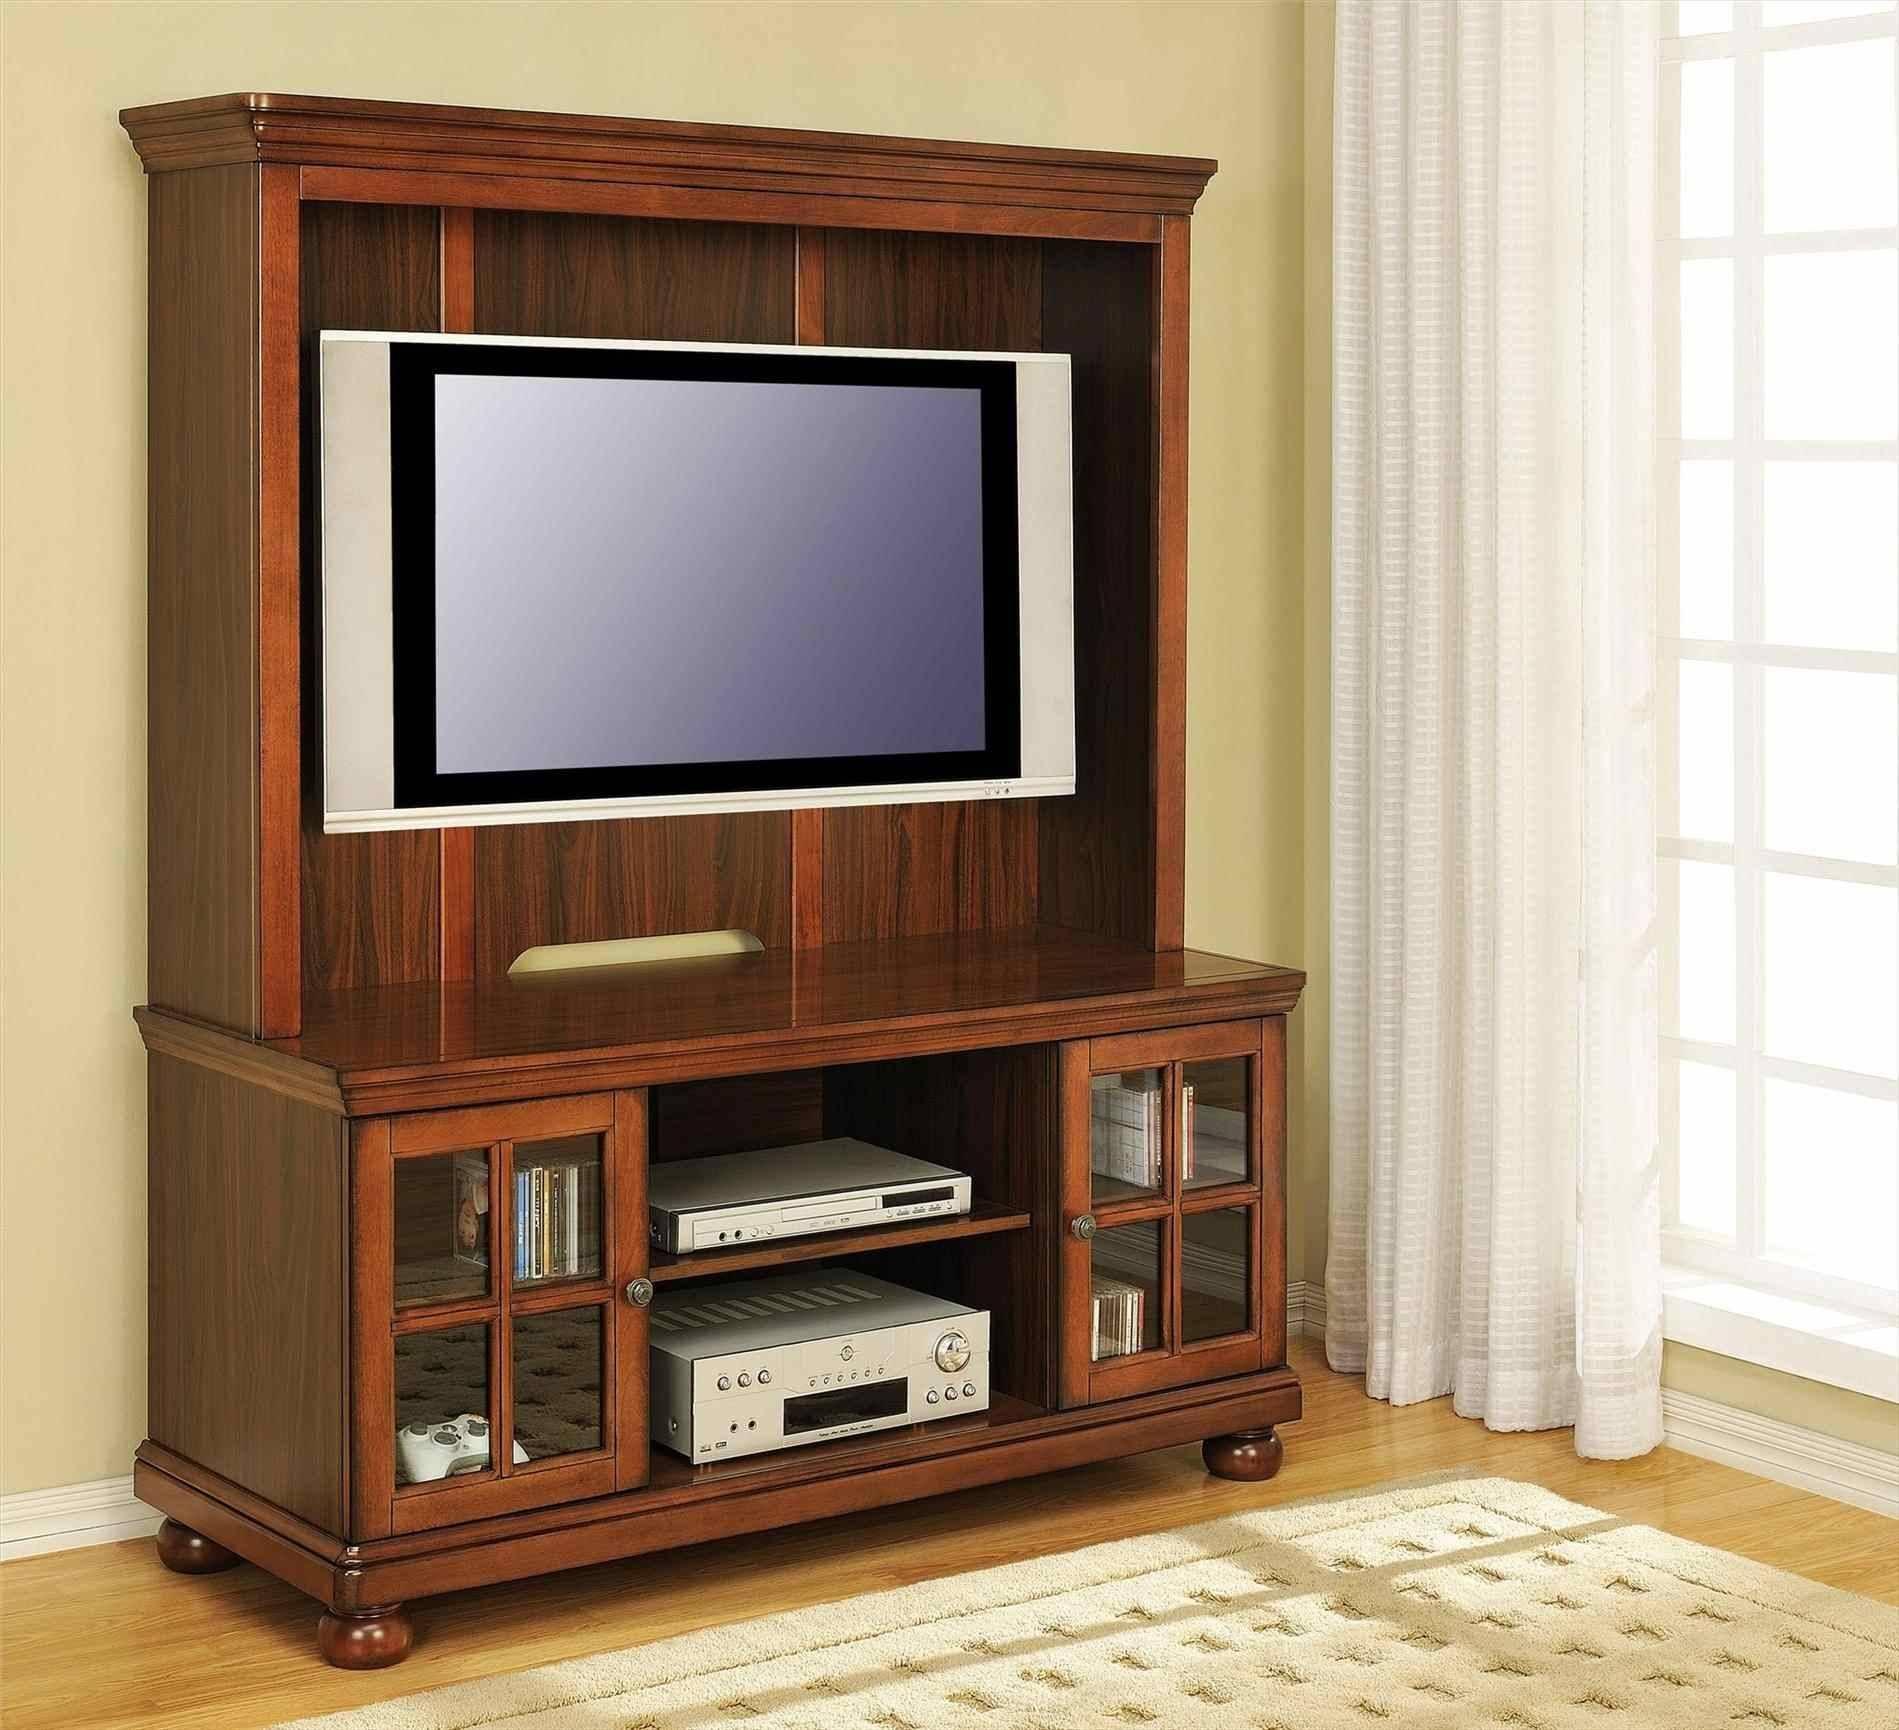 Solid Oak With Doors Great Dark Brown Wood Stand Glass Of Dazzling with regard to Dark Brown Corner Tv Stands (Image 10 of 15)